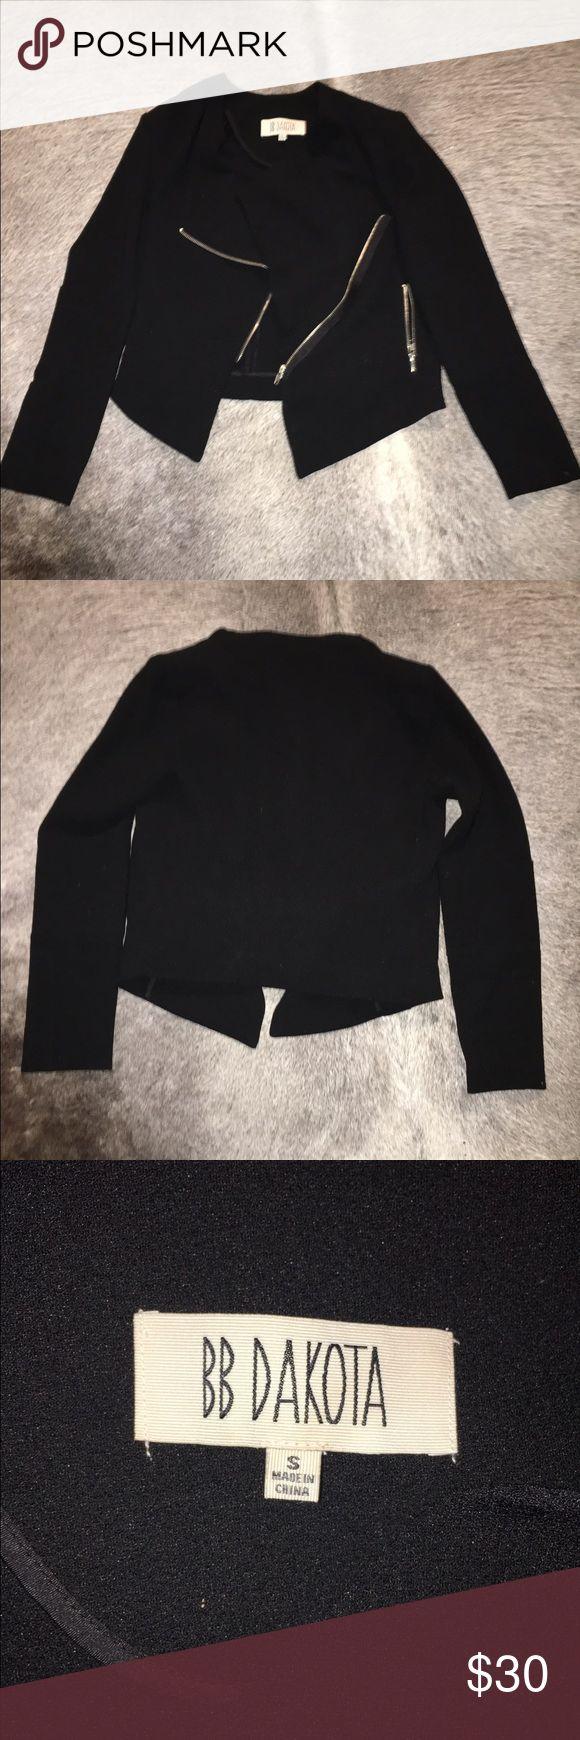 Brand new without tags BB Dakota black jacket - Sm Brand new without tags from Bloomingdales. Size Small. BB Dakota Jackets & Coats Blazers